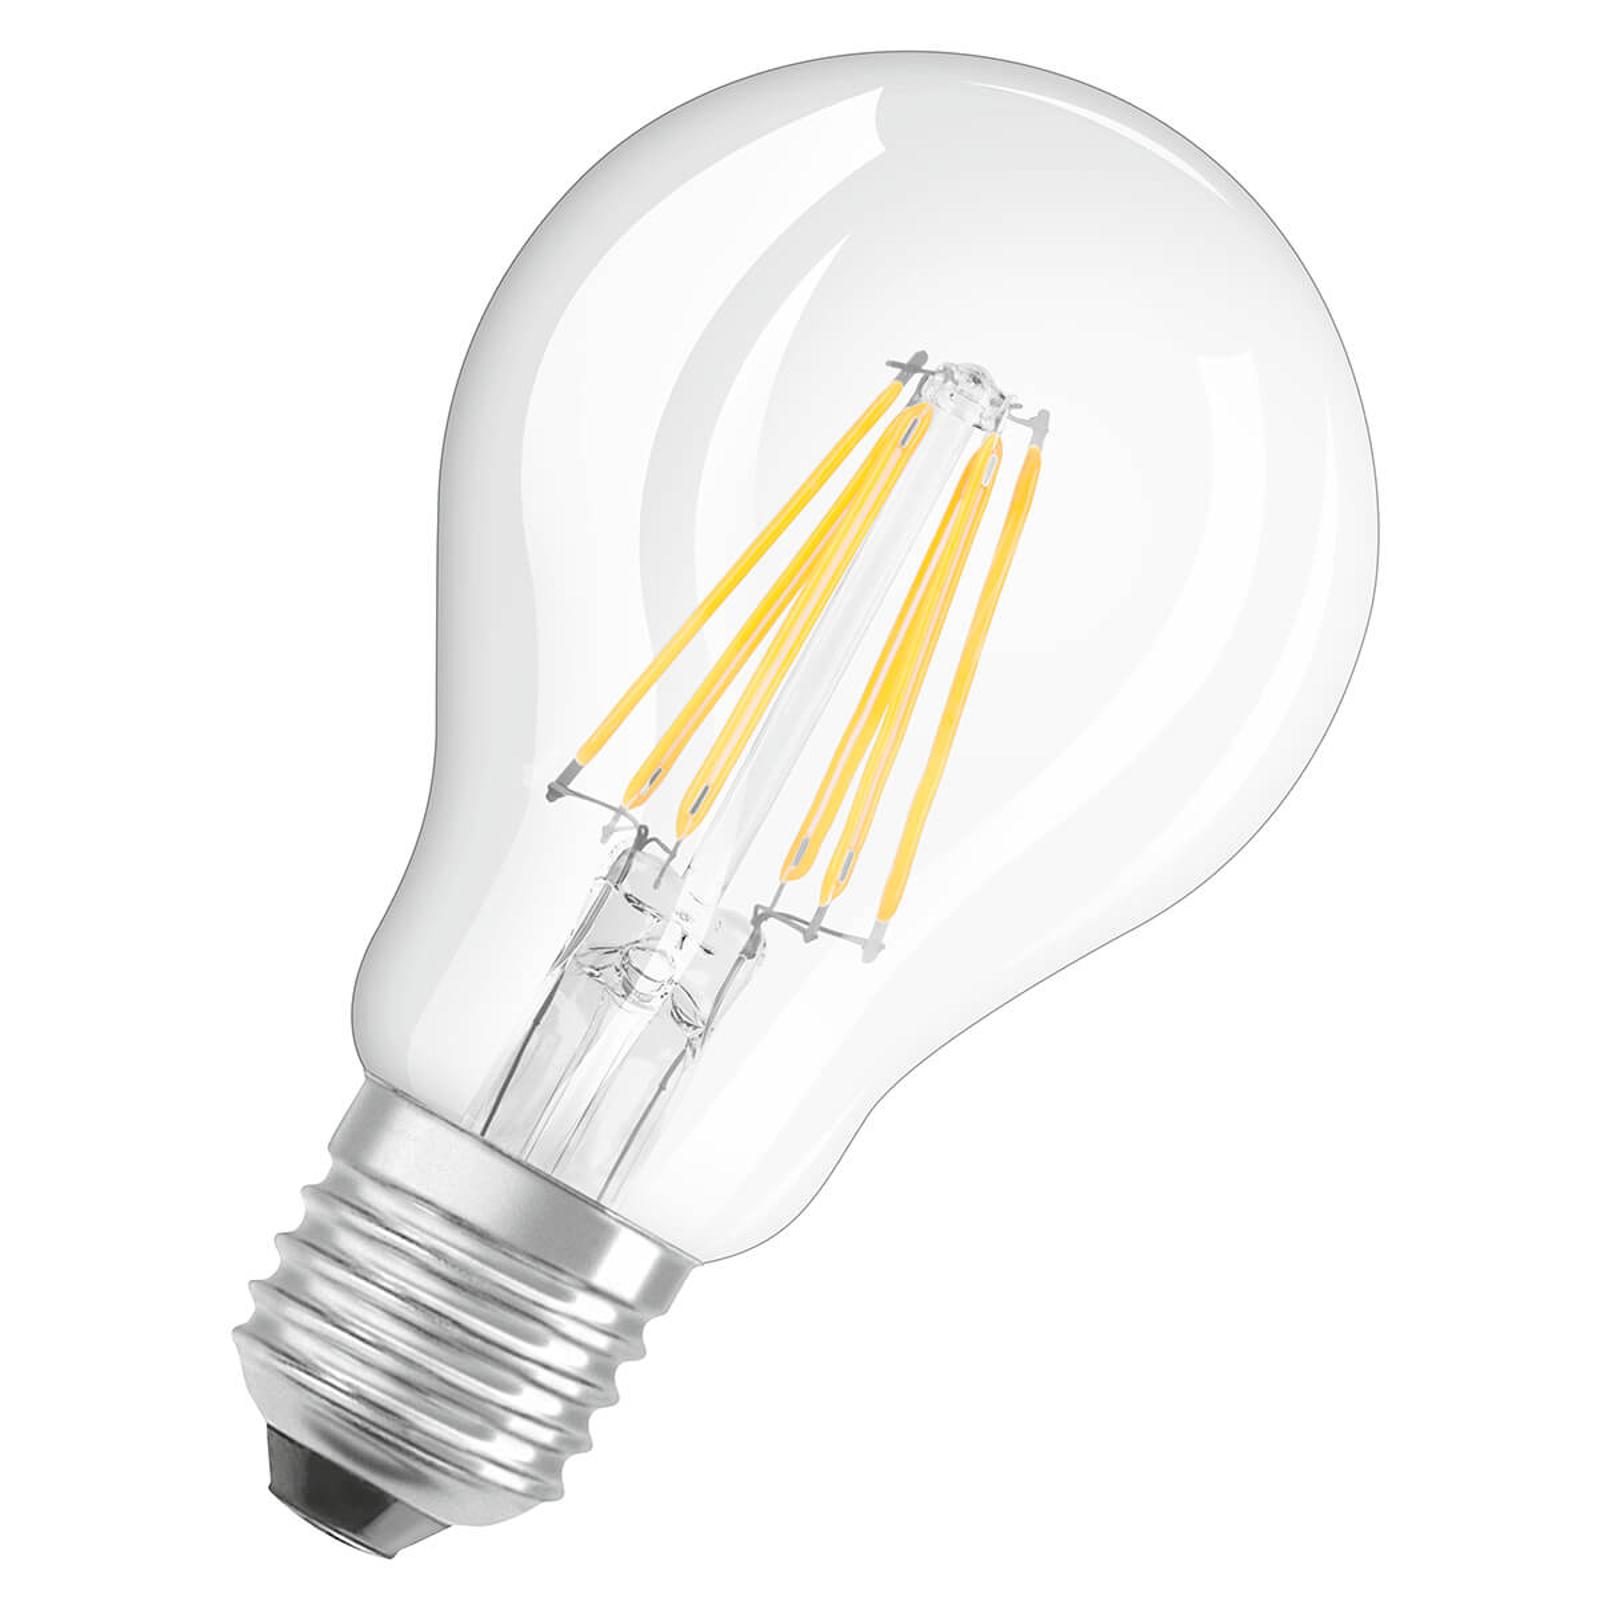 LED gloeidraad lamp E27 7,5W, warmwit, dimbaar